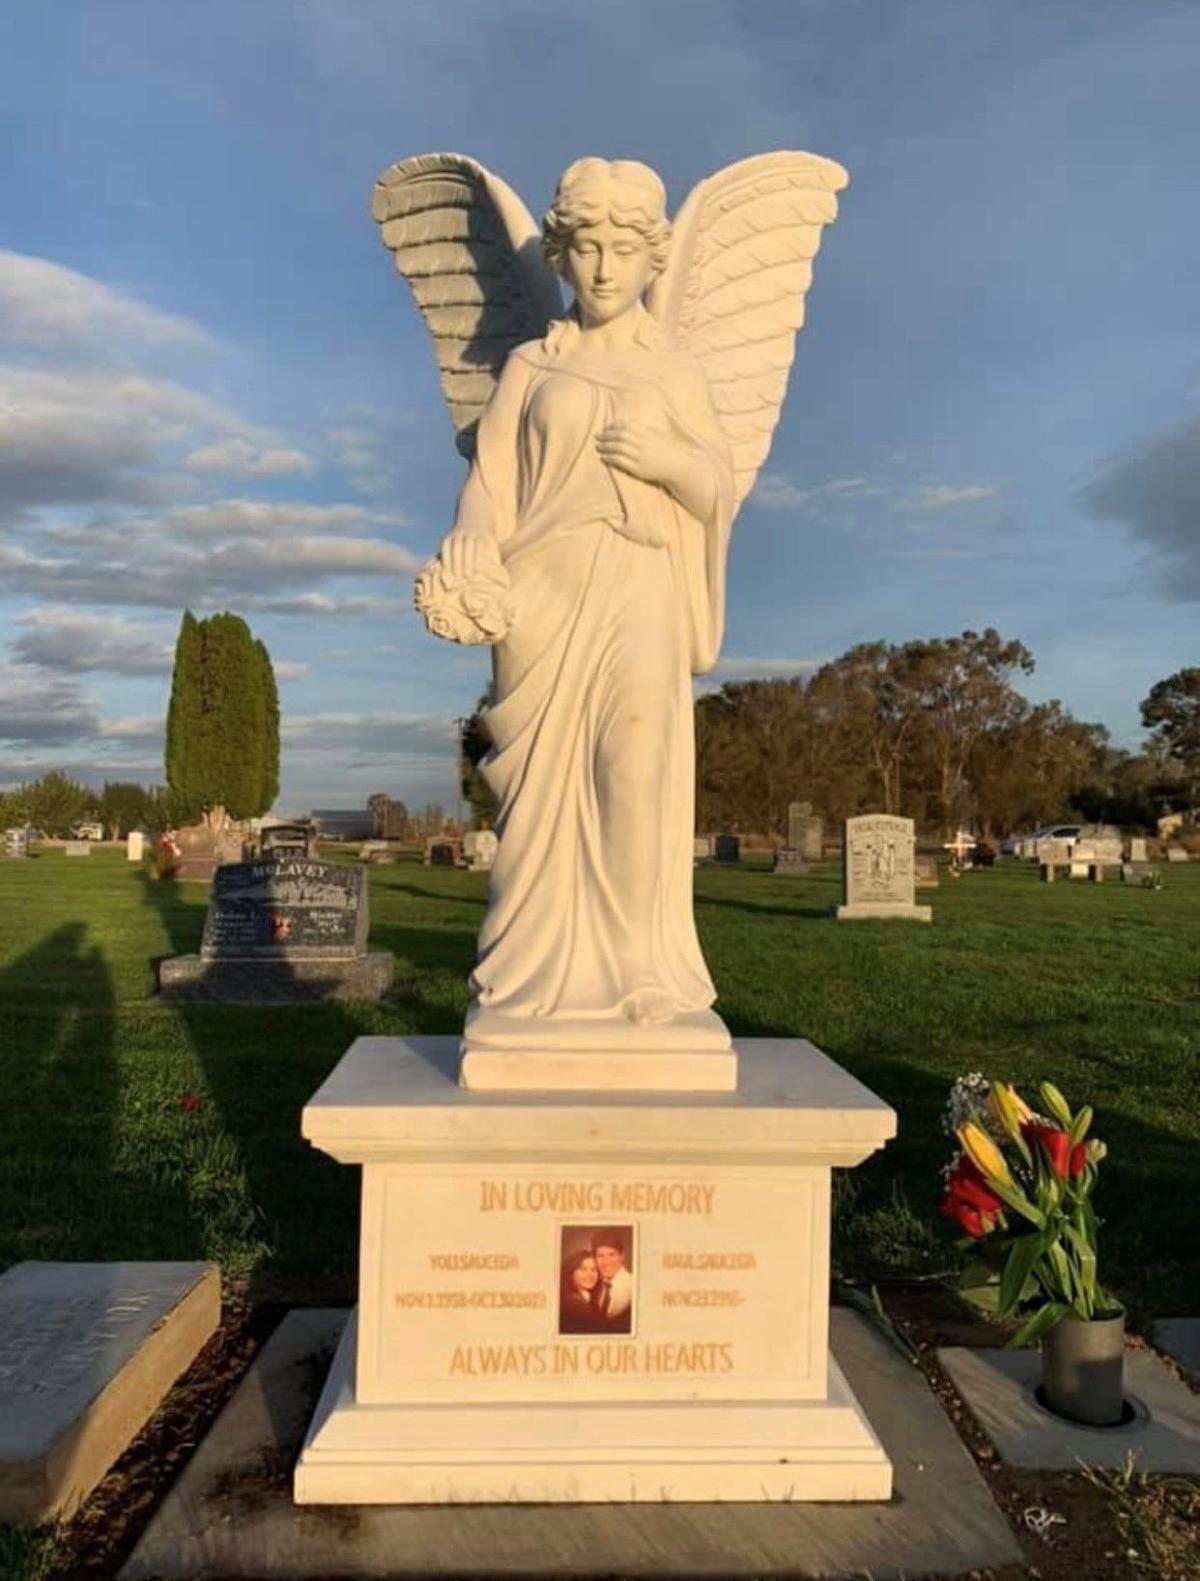 211014-es-news-angelstatue